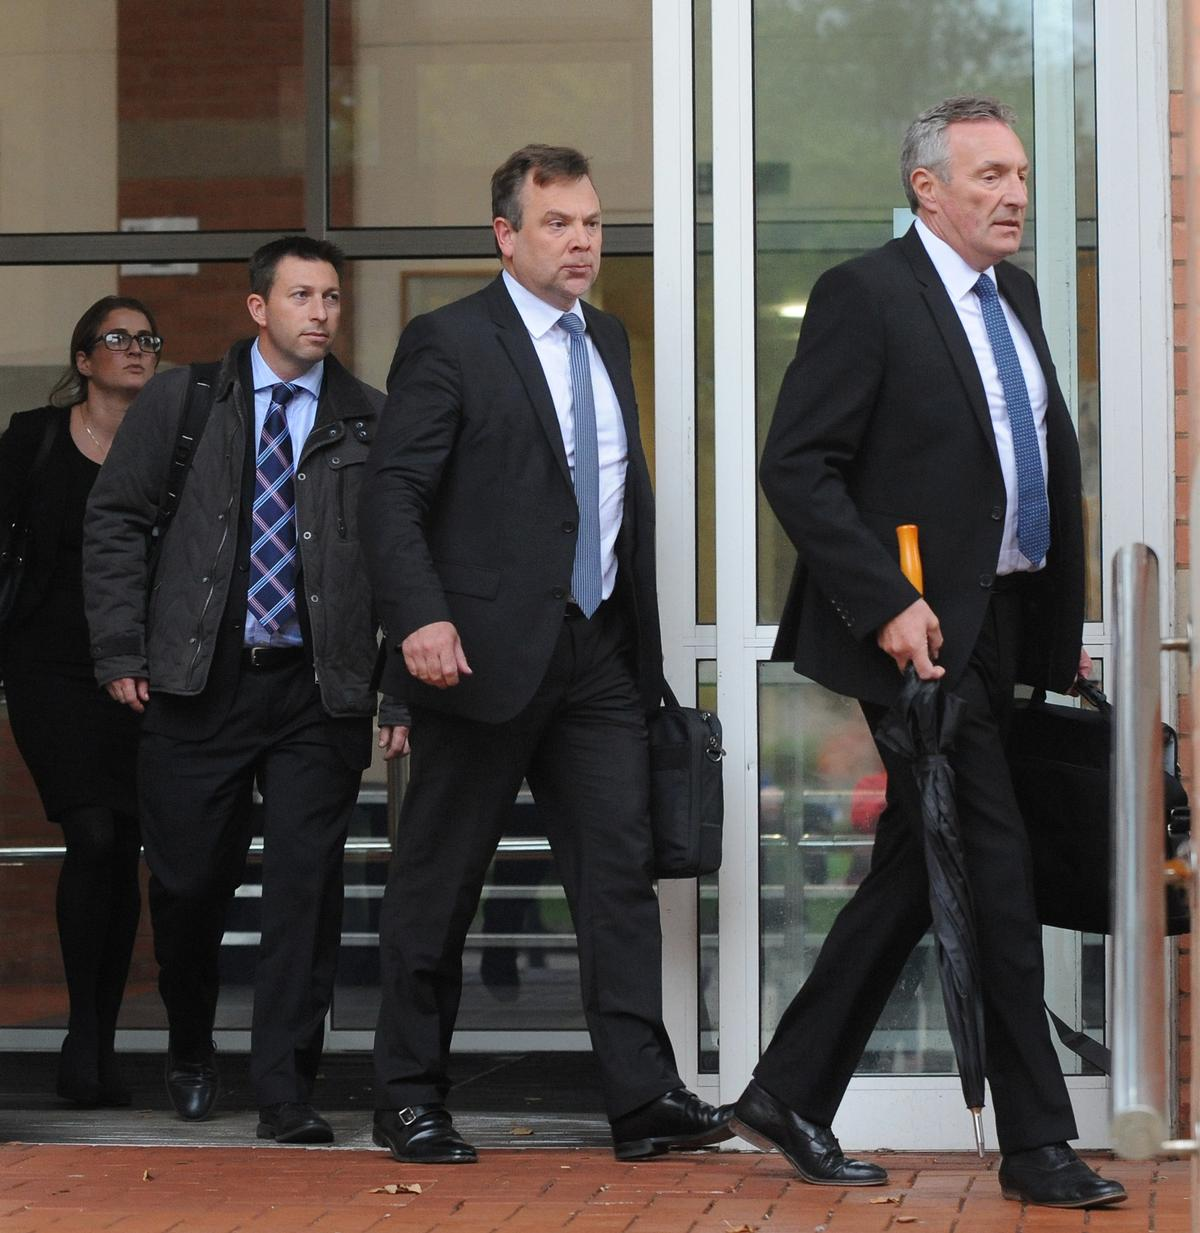 Merlin's Dominic Wigley (left) Matt Jowett (centre) and Ian Crabbe (right) leaving Stafford Crown Court / Rui Vieira/PA Wire/Press Association Images